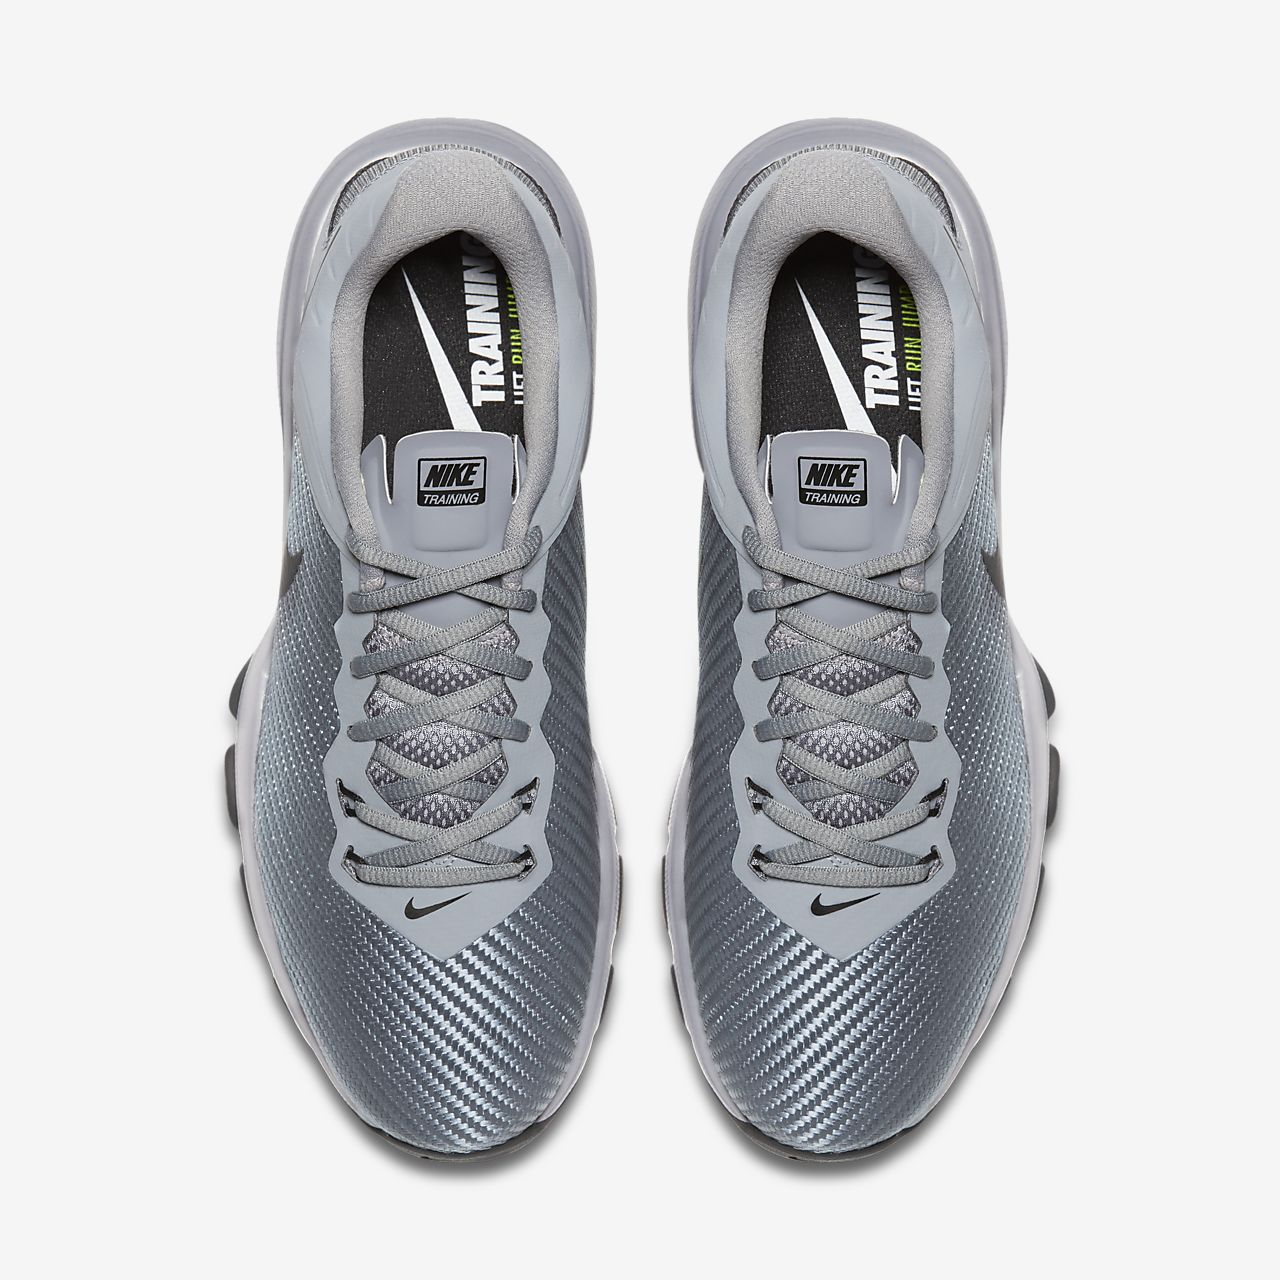 dce6c49e0a3038 Nike Air Max Full Ride TR 1.5 Men s Training Shoe. Nike.com LU